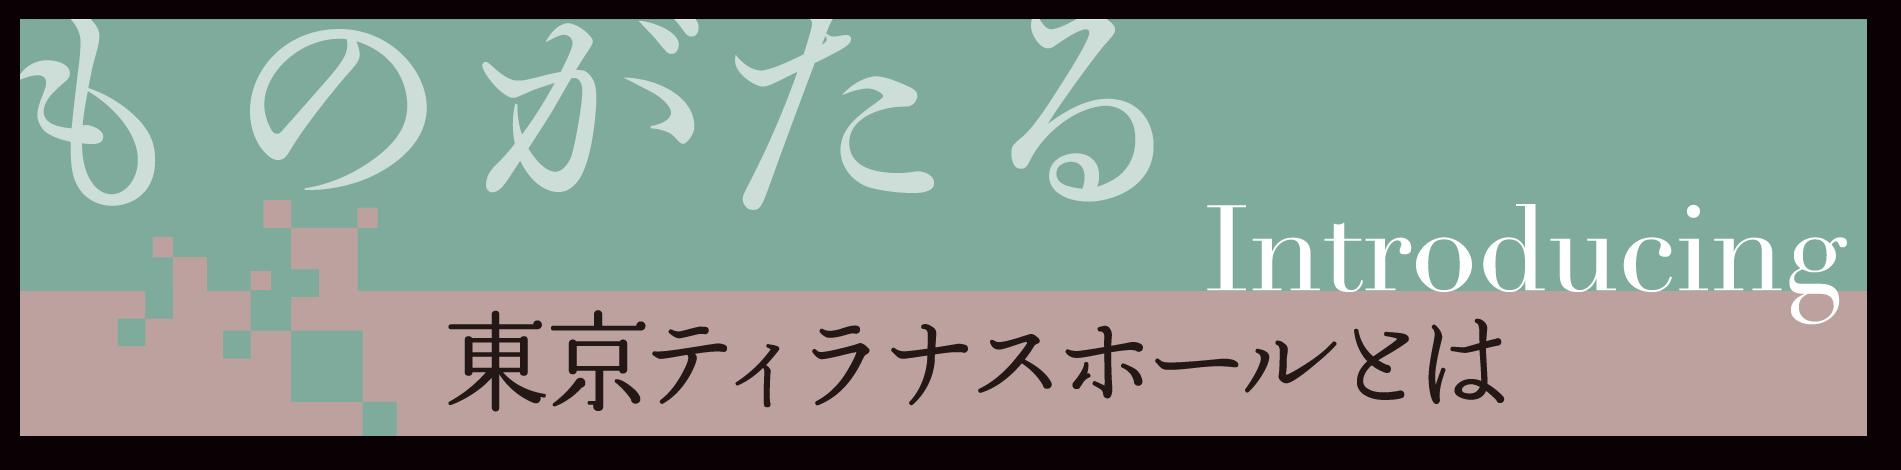 monogataru_banner.png